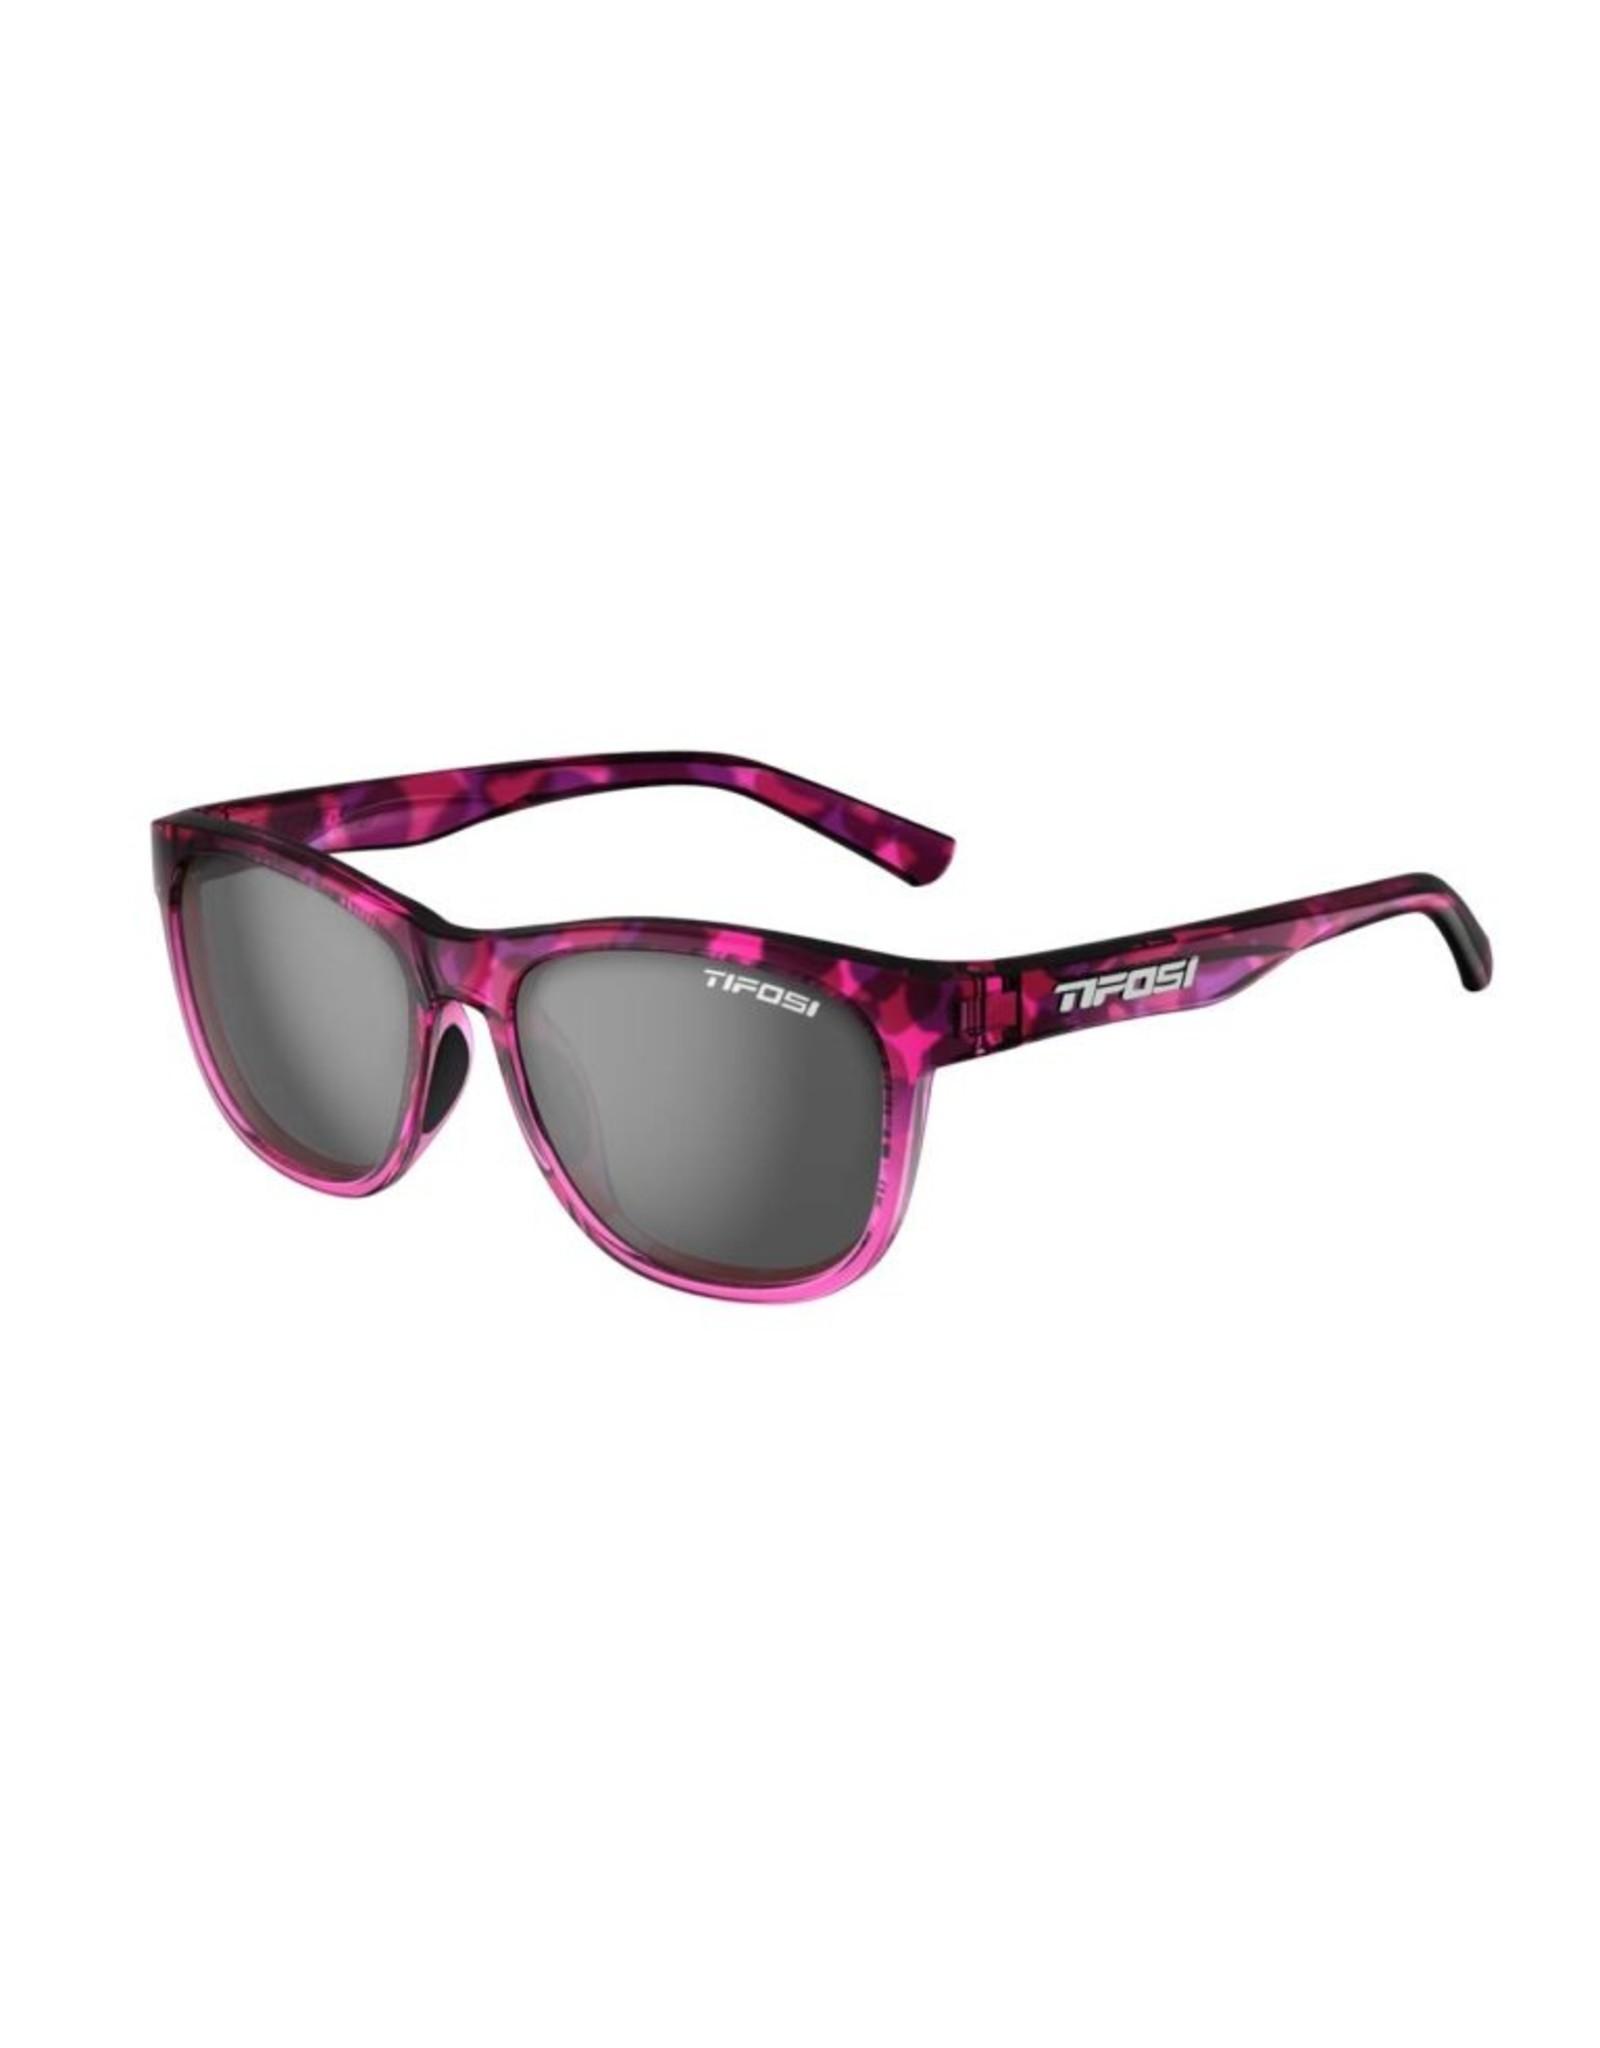 Tifosi Optics Swank, Pink Confetti Single Lens Sunglasses - Smoke